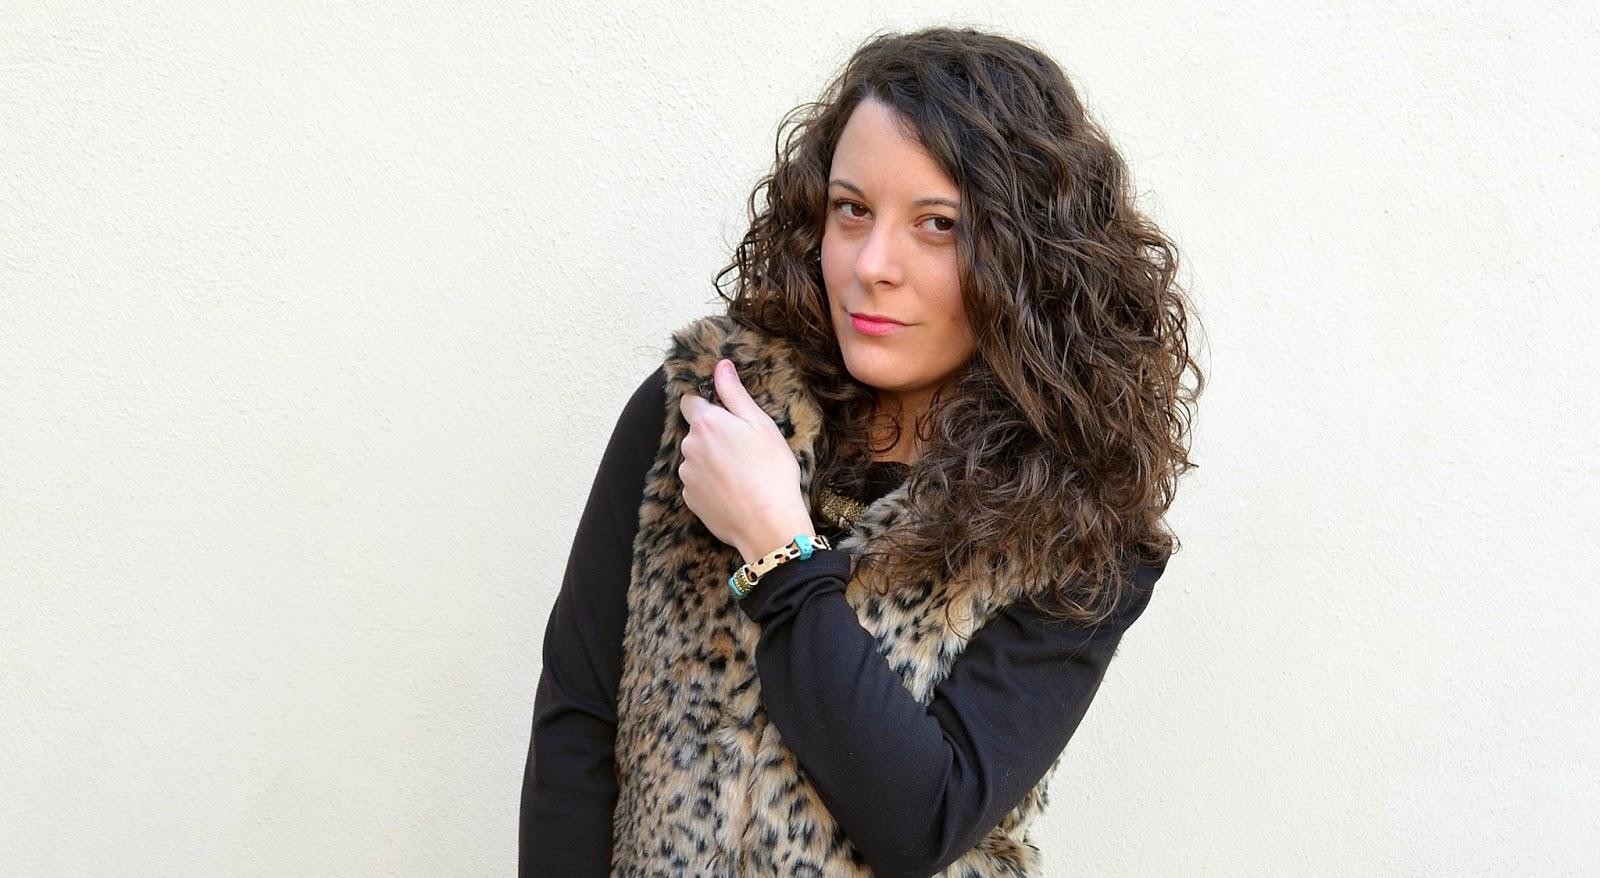 fur vest, blogger, look, chaleco, pelo, castellon, mi vestido azul, outfits, lbd, fashion blog